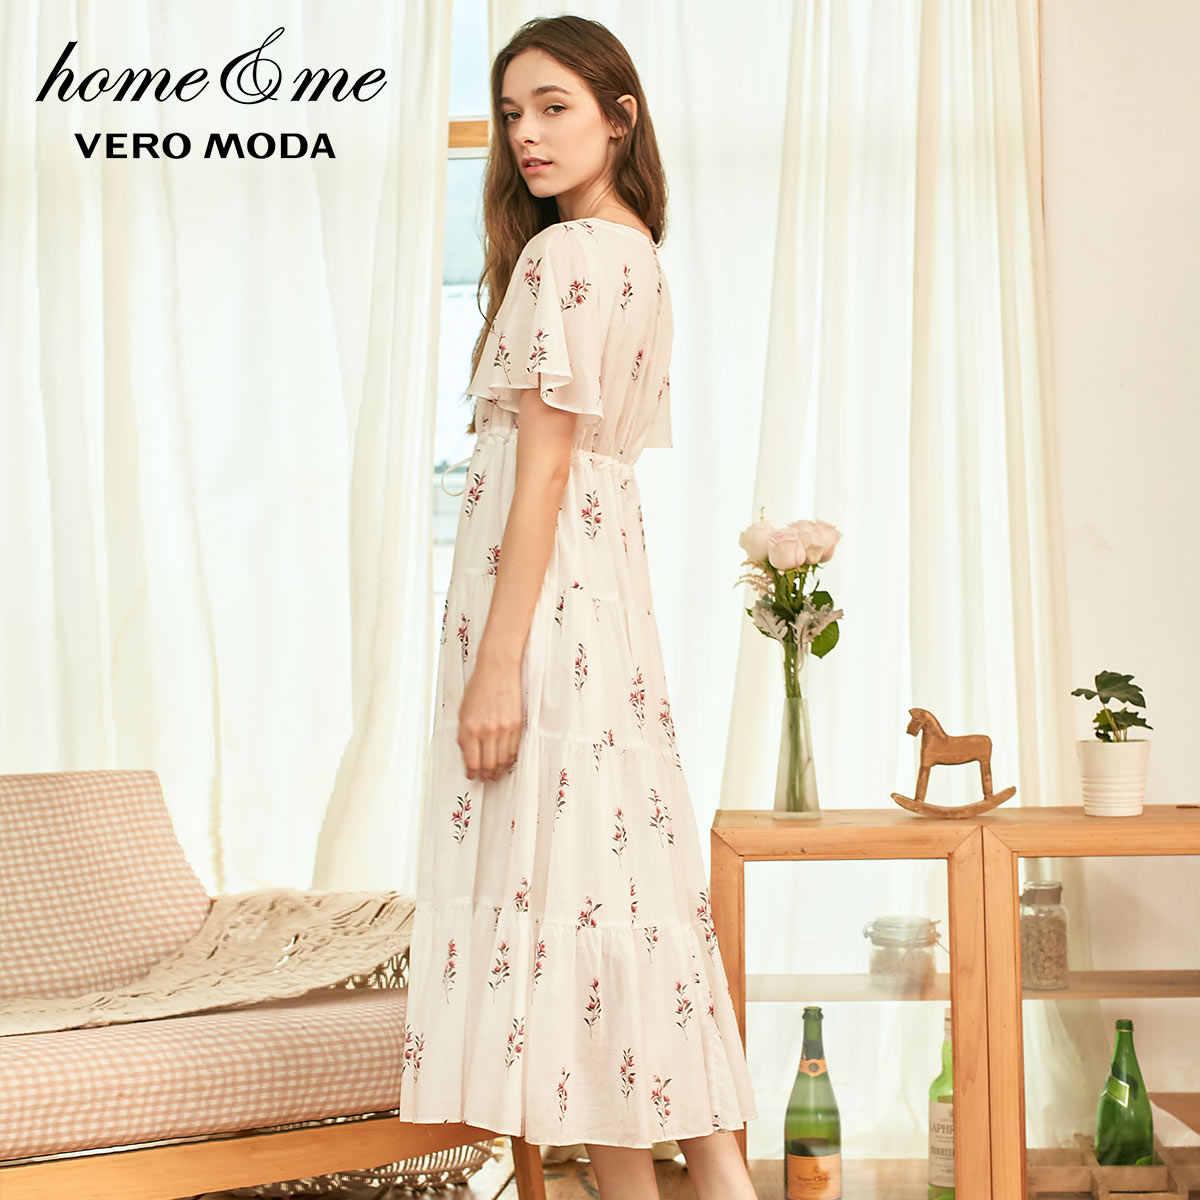 Vero Moda وصل حديثاً زهري 100% قطن فستان سهرة Homewear فستان | 31917B507